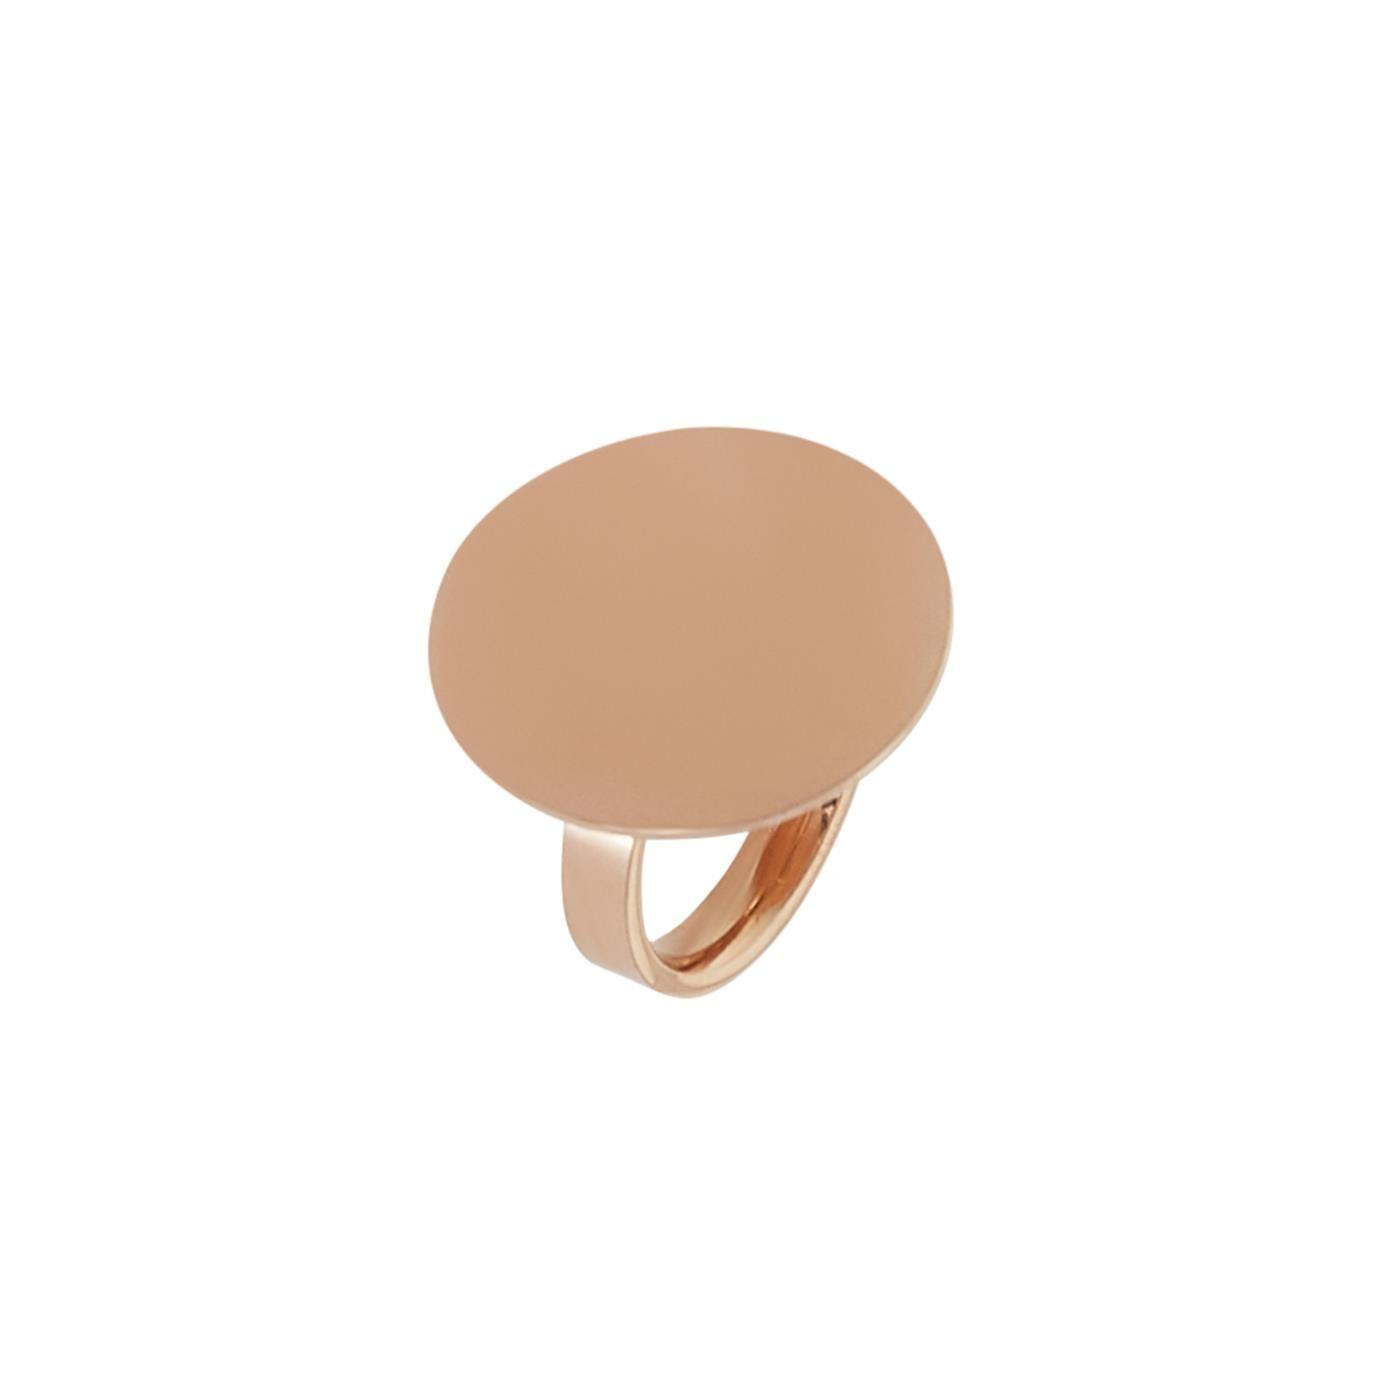 Celestino Στρογγυλό δαχτυλίδι  - Ροζ - Grootte: 19